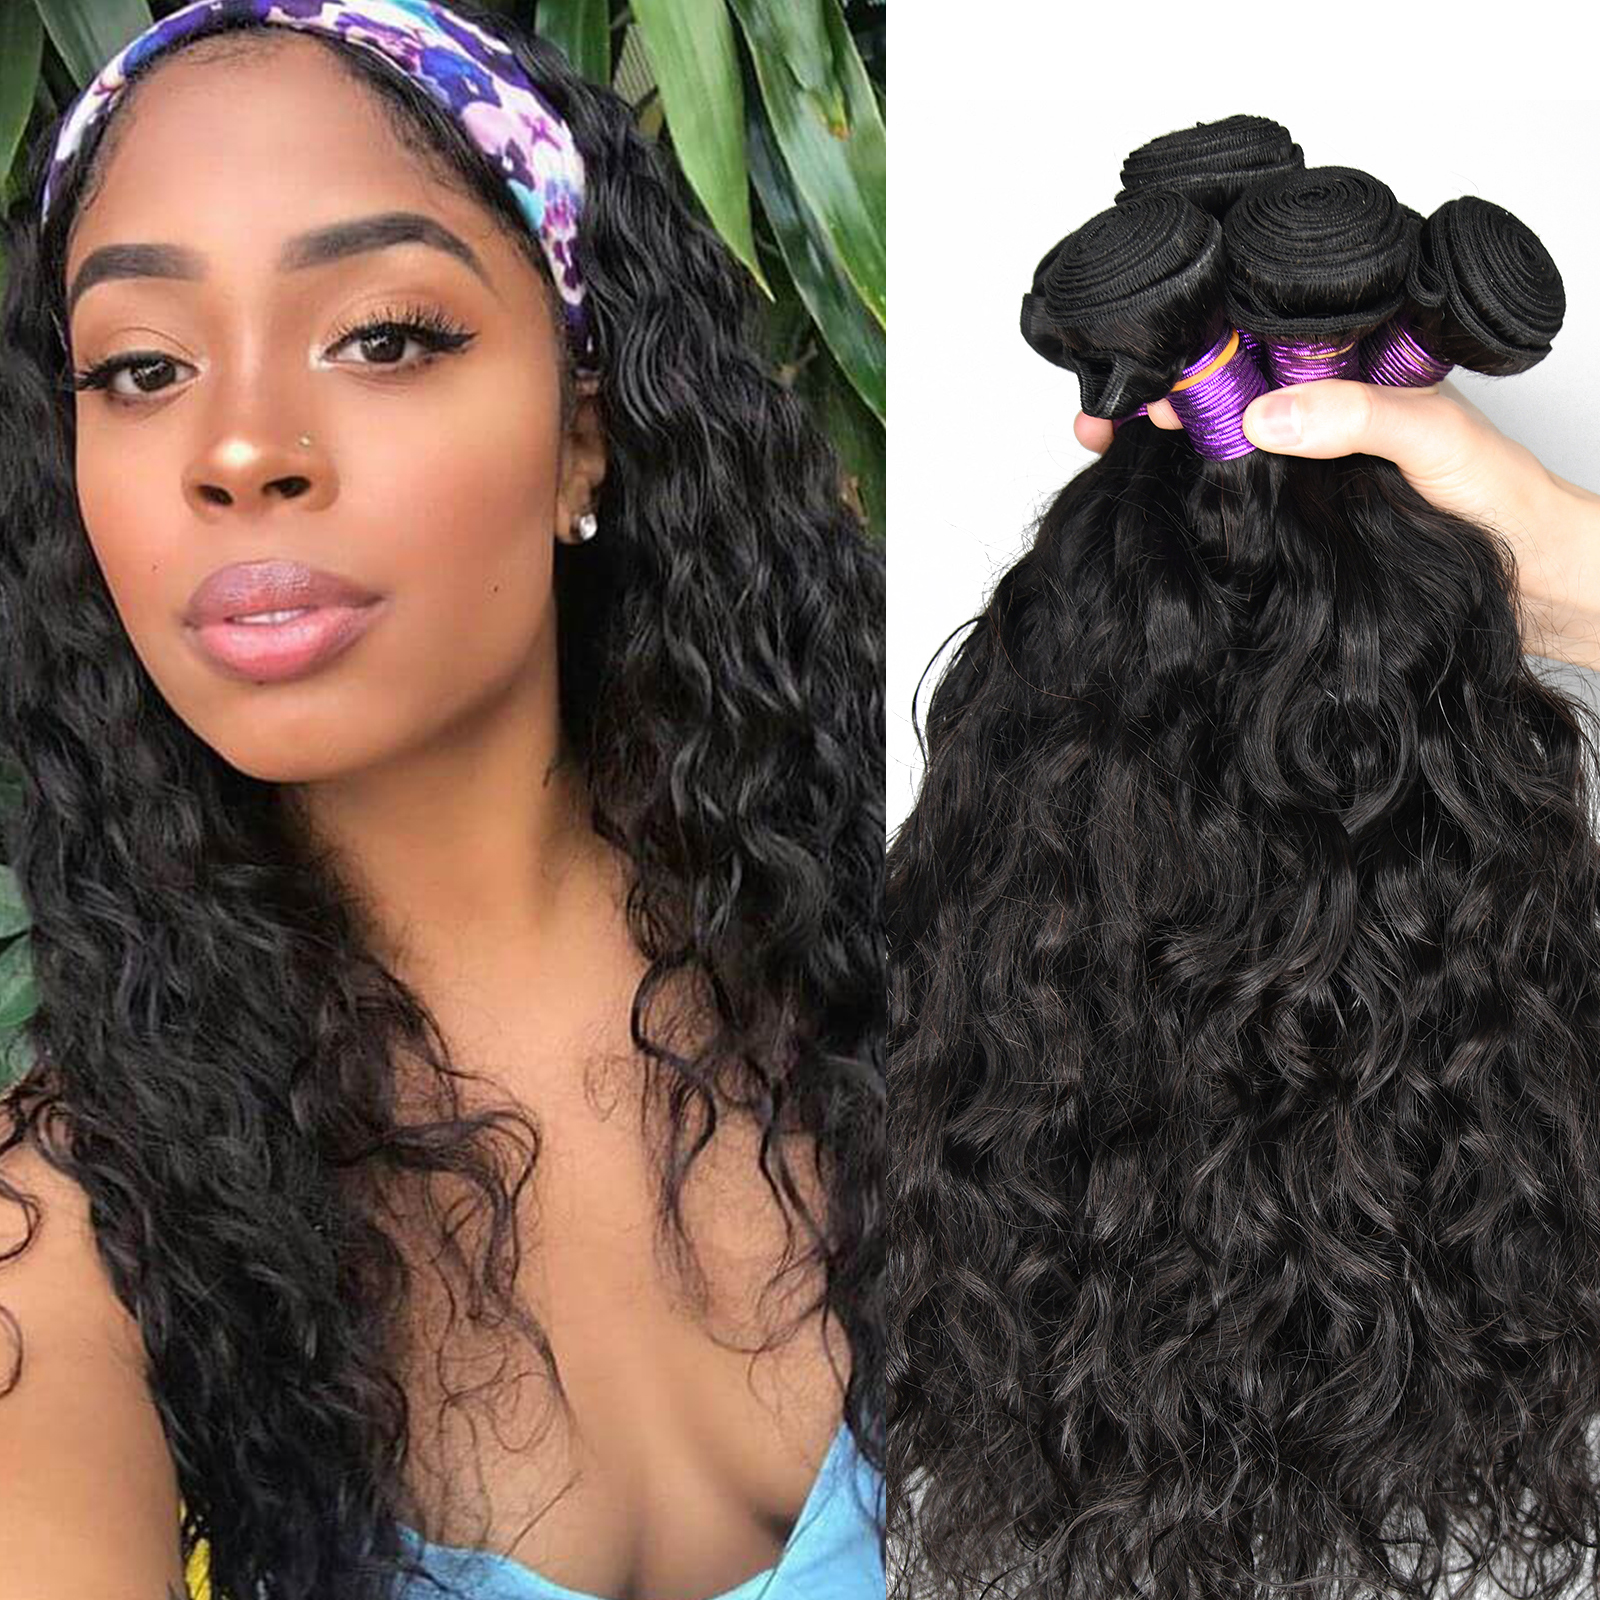 Paruks-mechones de cabello indio crudo, cabello Natural ondulado 100%, cabello virgen humano tejido, paquetes de cabello al mayor mechones, extensiones para mujer negra